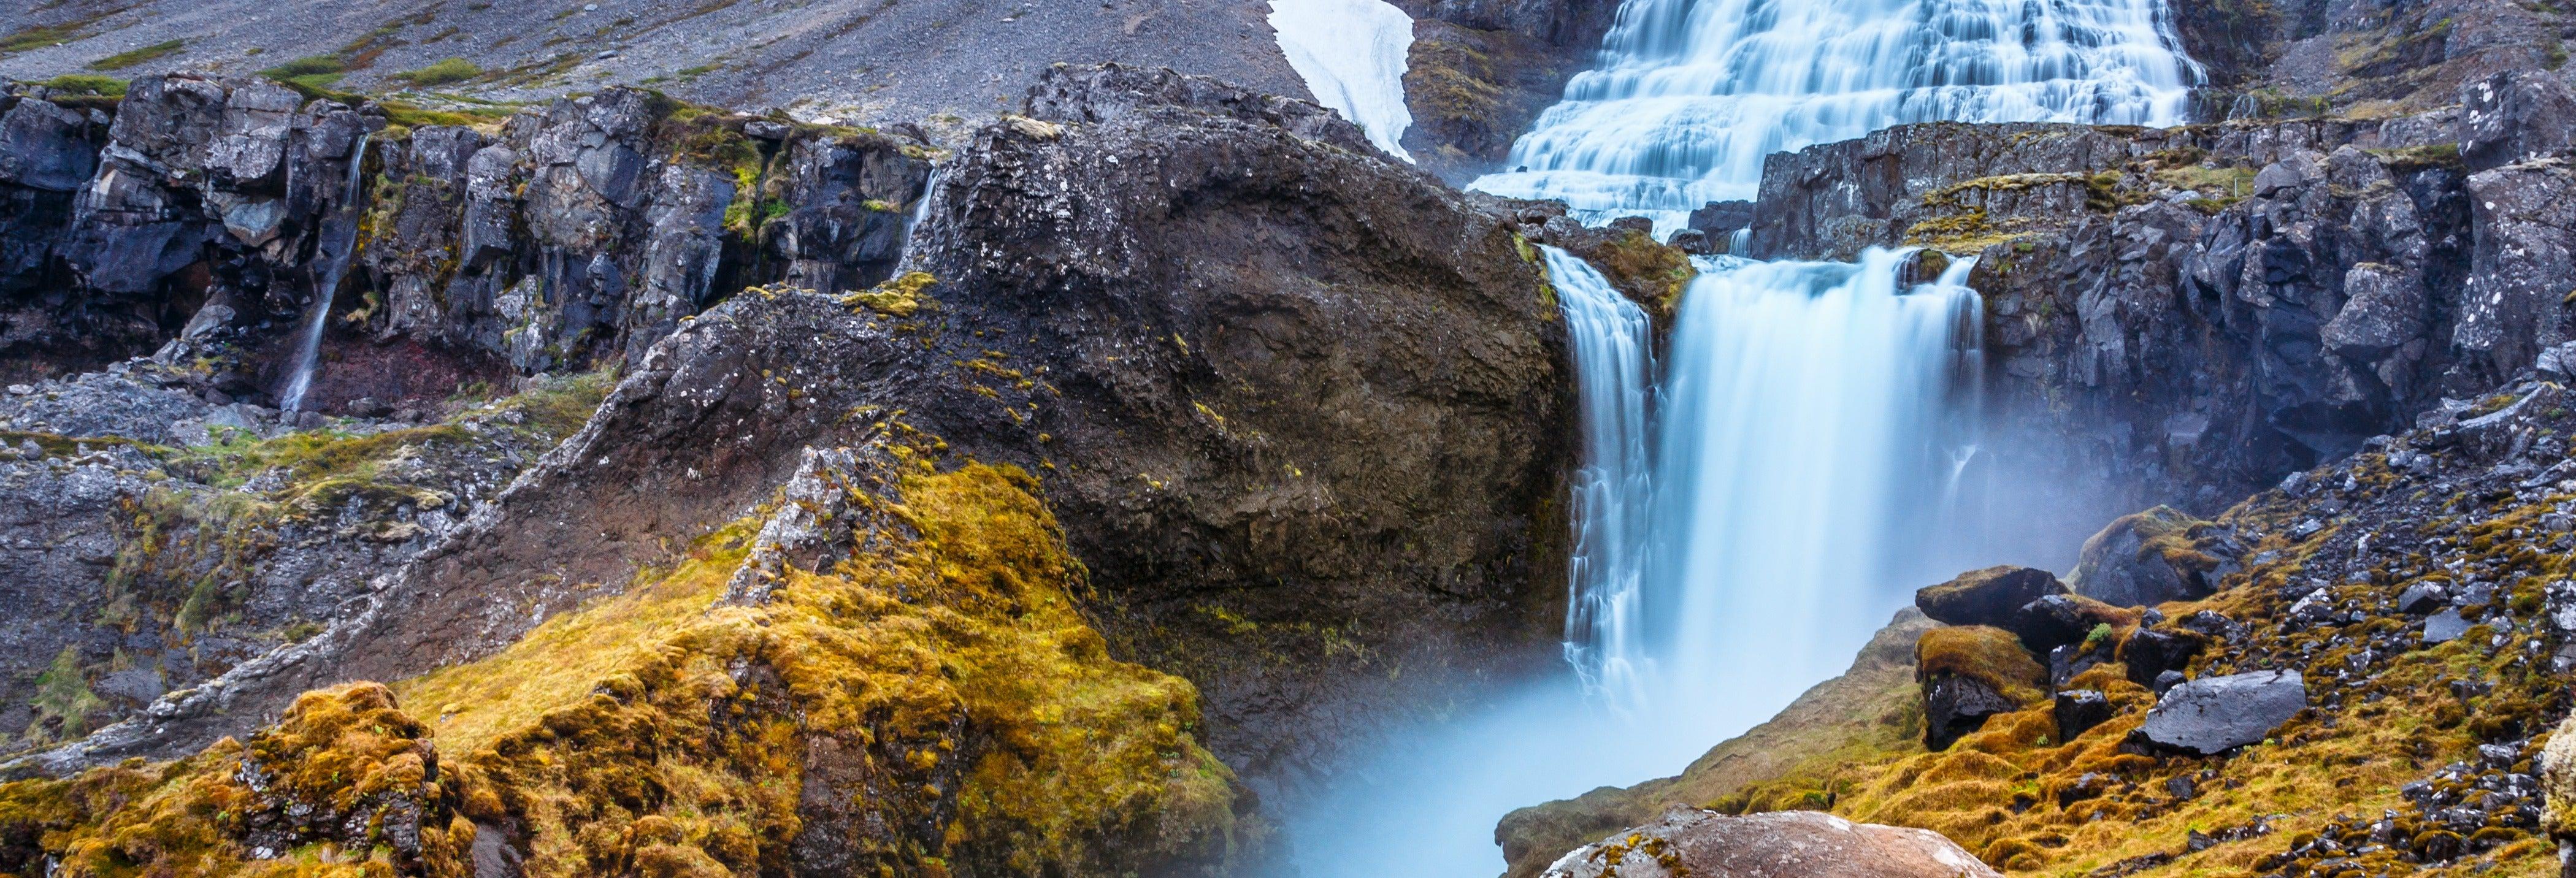 Escursione a Dynjandi, Arnarfjördur e Bíldudalur